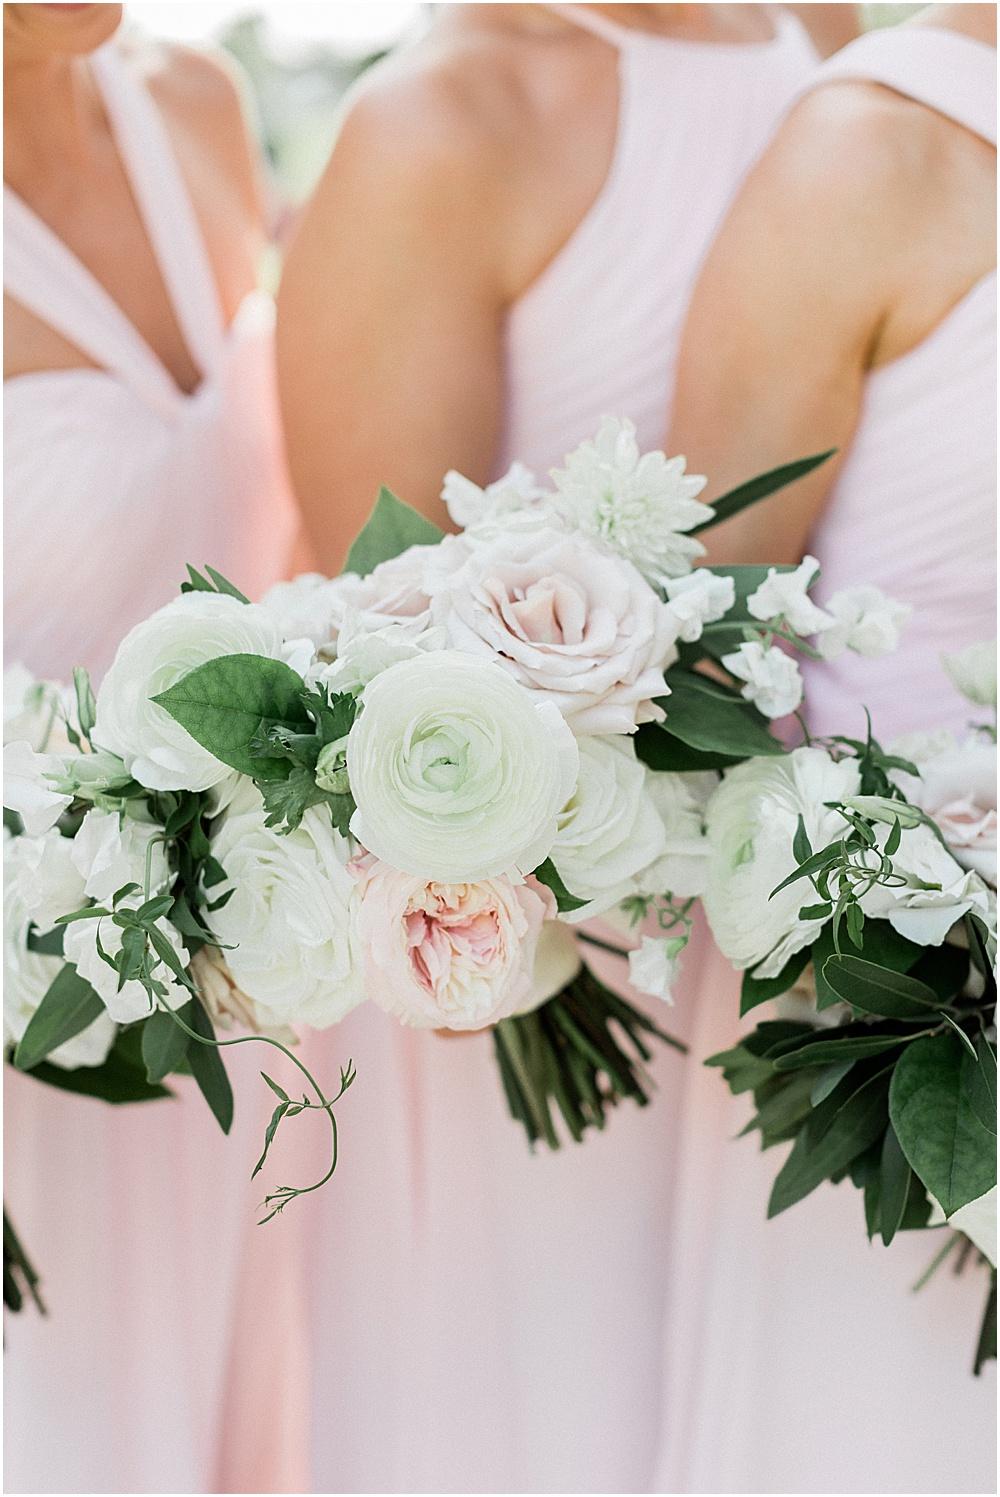 willowbend_country_club_colleen_brett_wild_dahlia_cw_events_cape_cod_massachusetts_boston_wedding_photographer_meredith_jane_photography_photo_0584.jpg